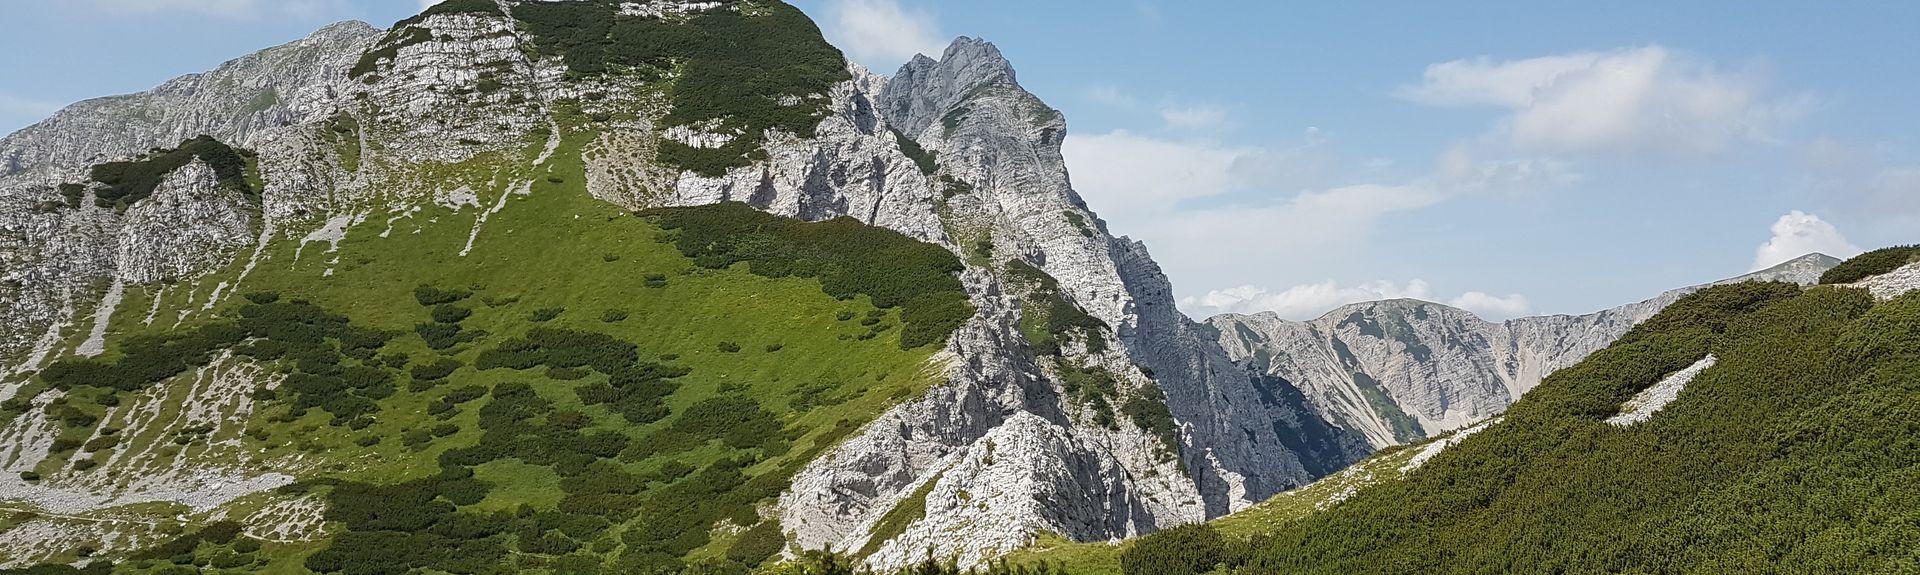 Ferlach, Carinthie, Autriche